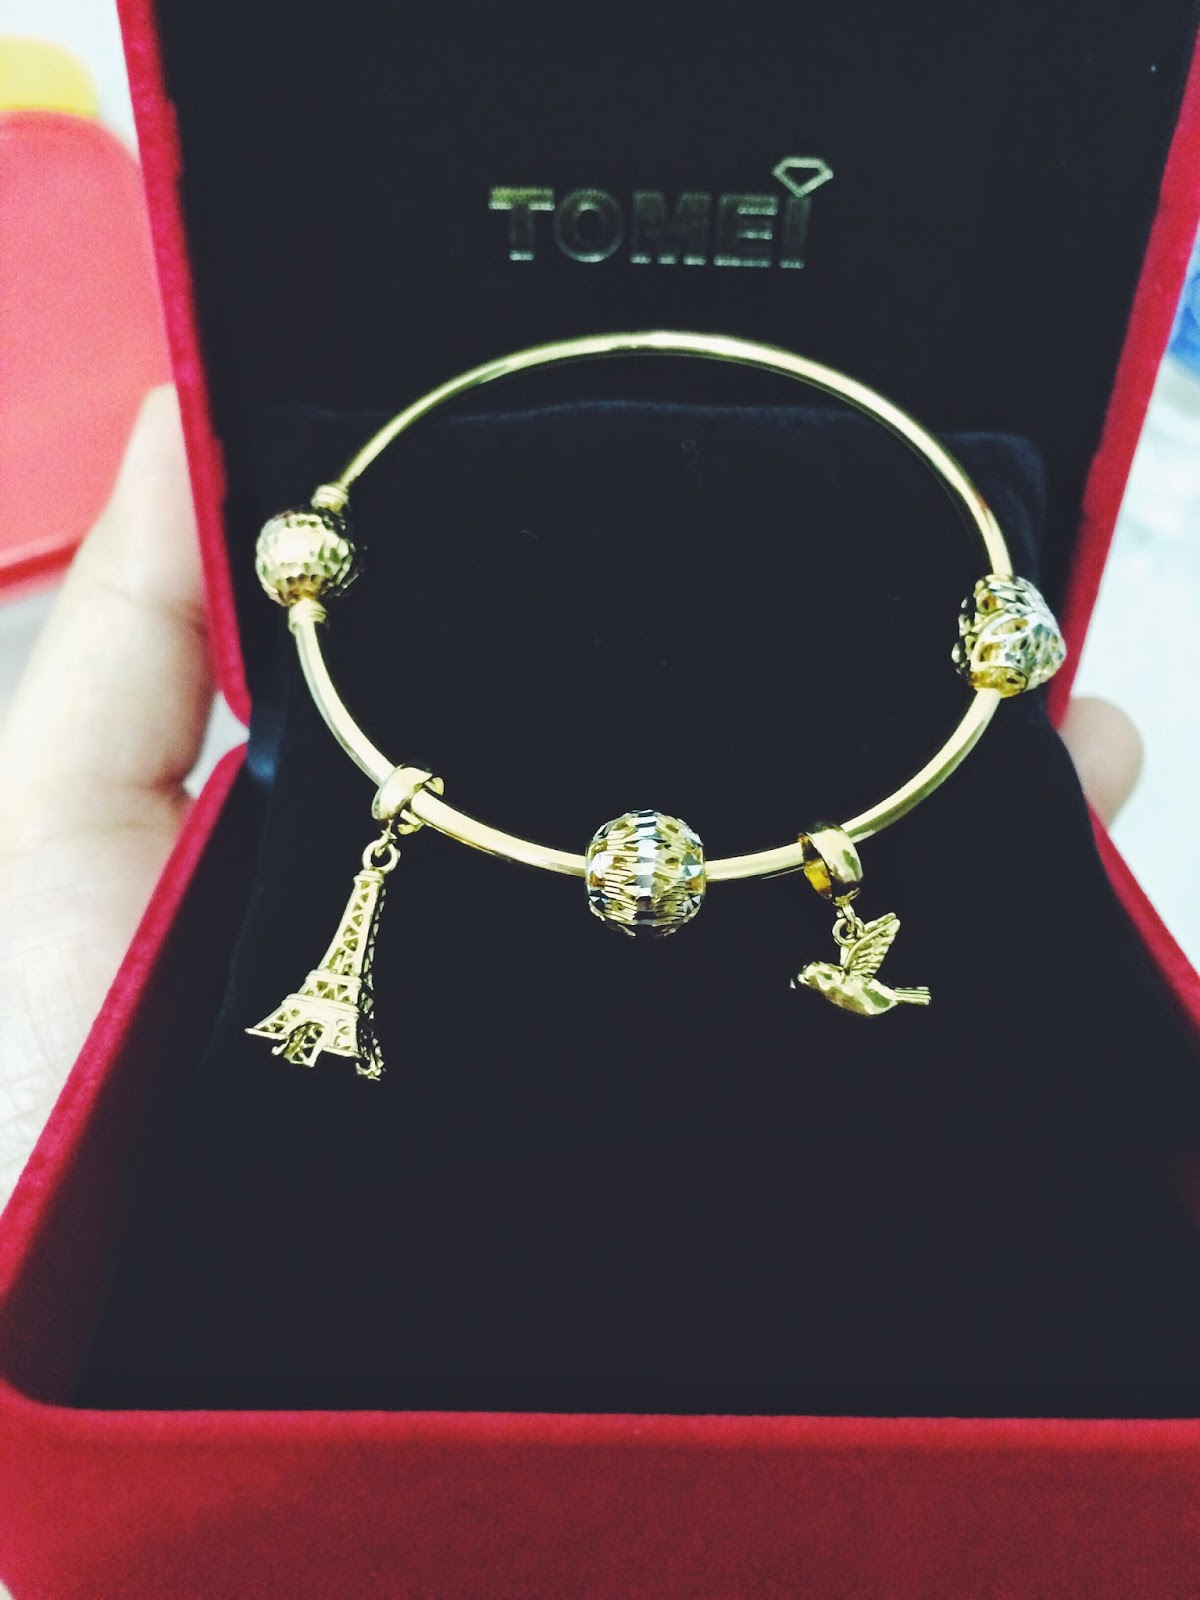 4d6374aaa ... charm pandora 916 photo photo photo photo ... Fits Pandora Bracelets  Golden ...